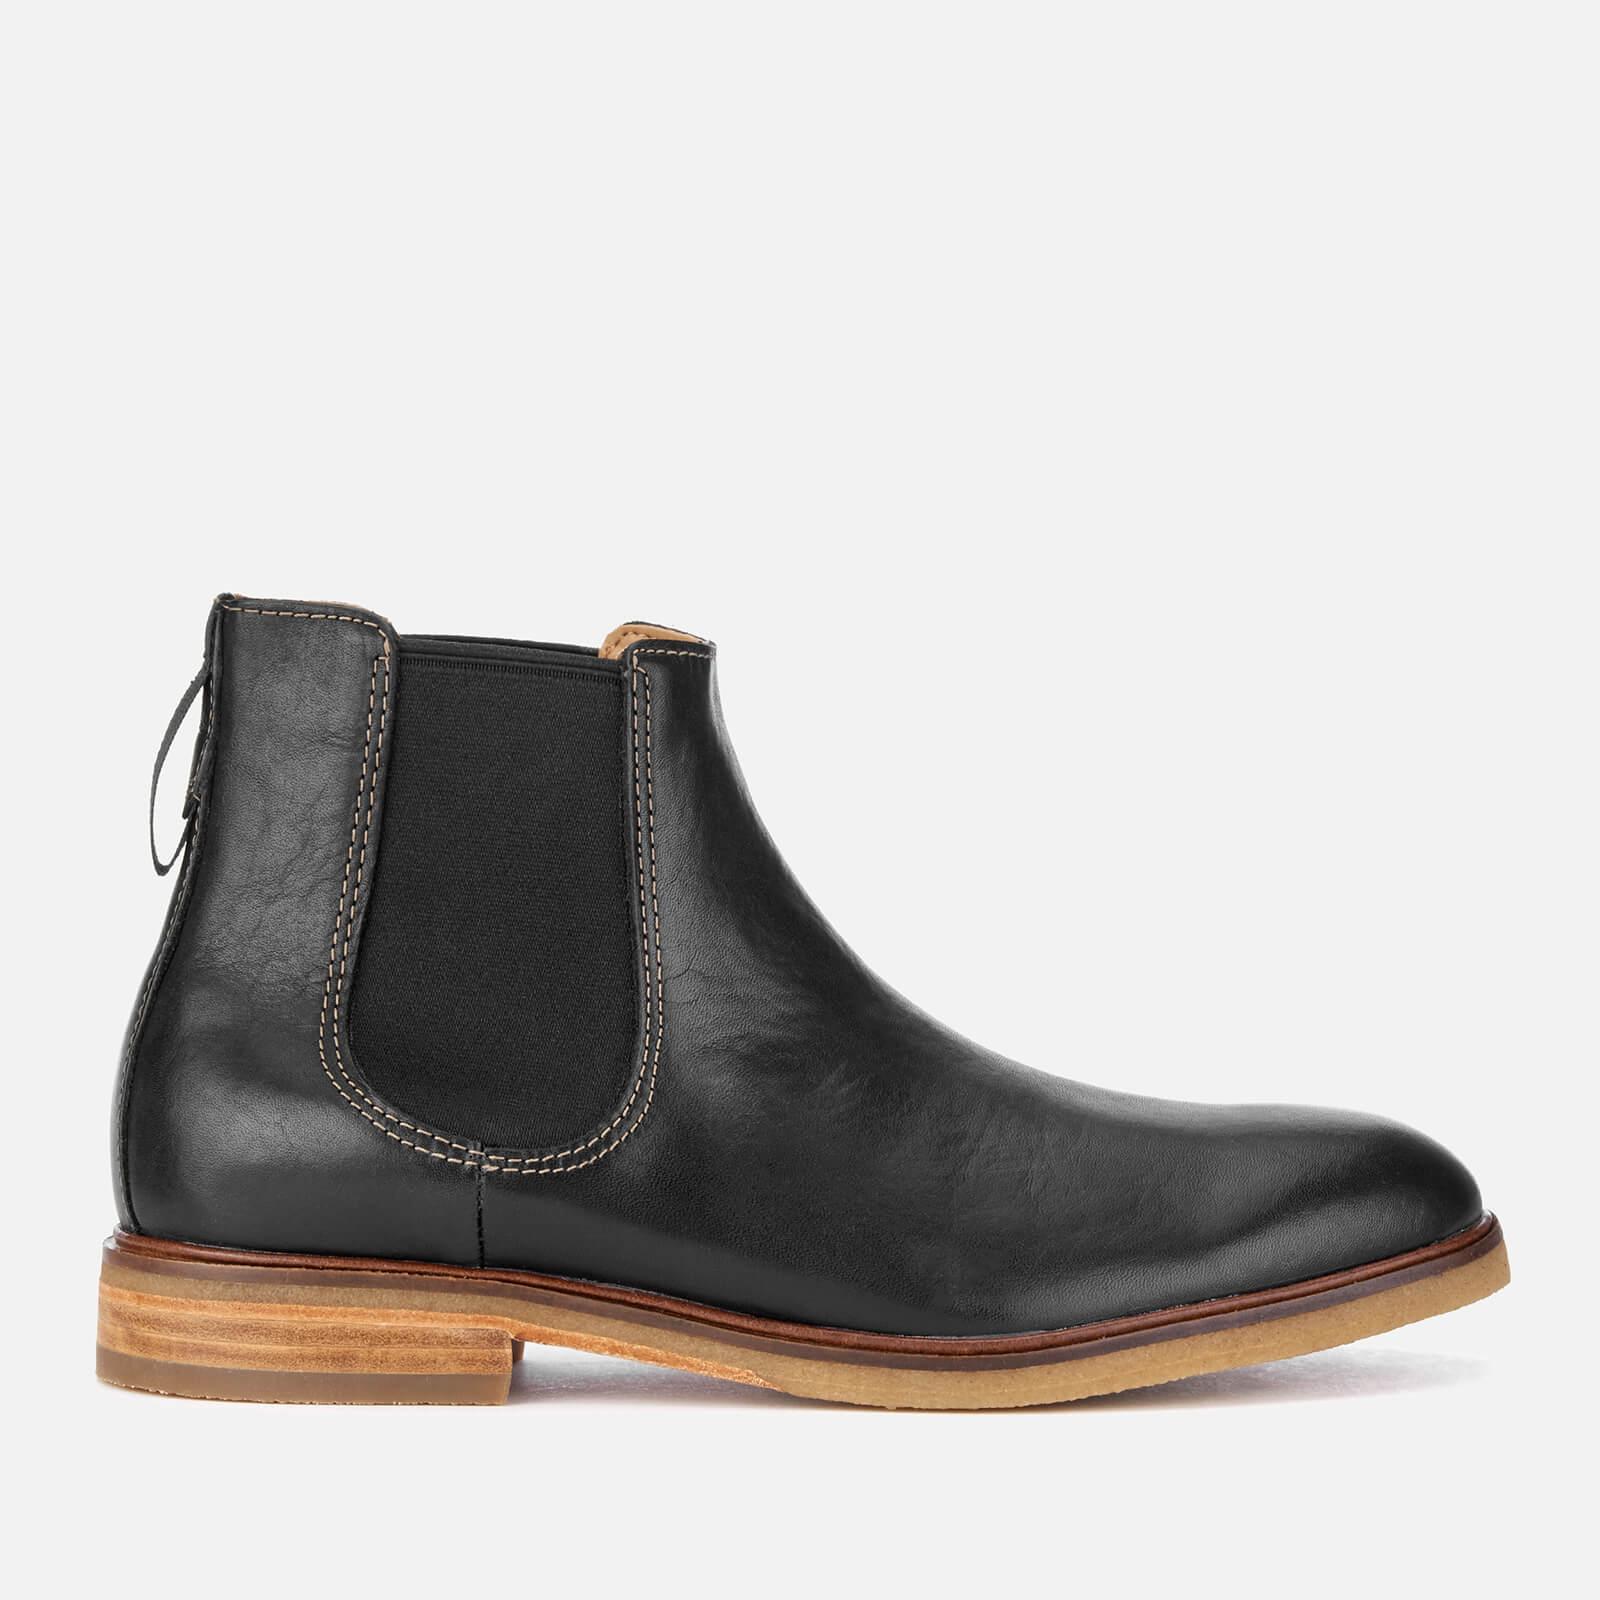 Clarks Men's Clarkdale Gobi Leather